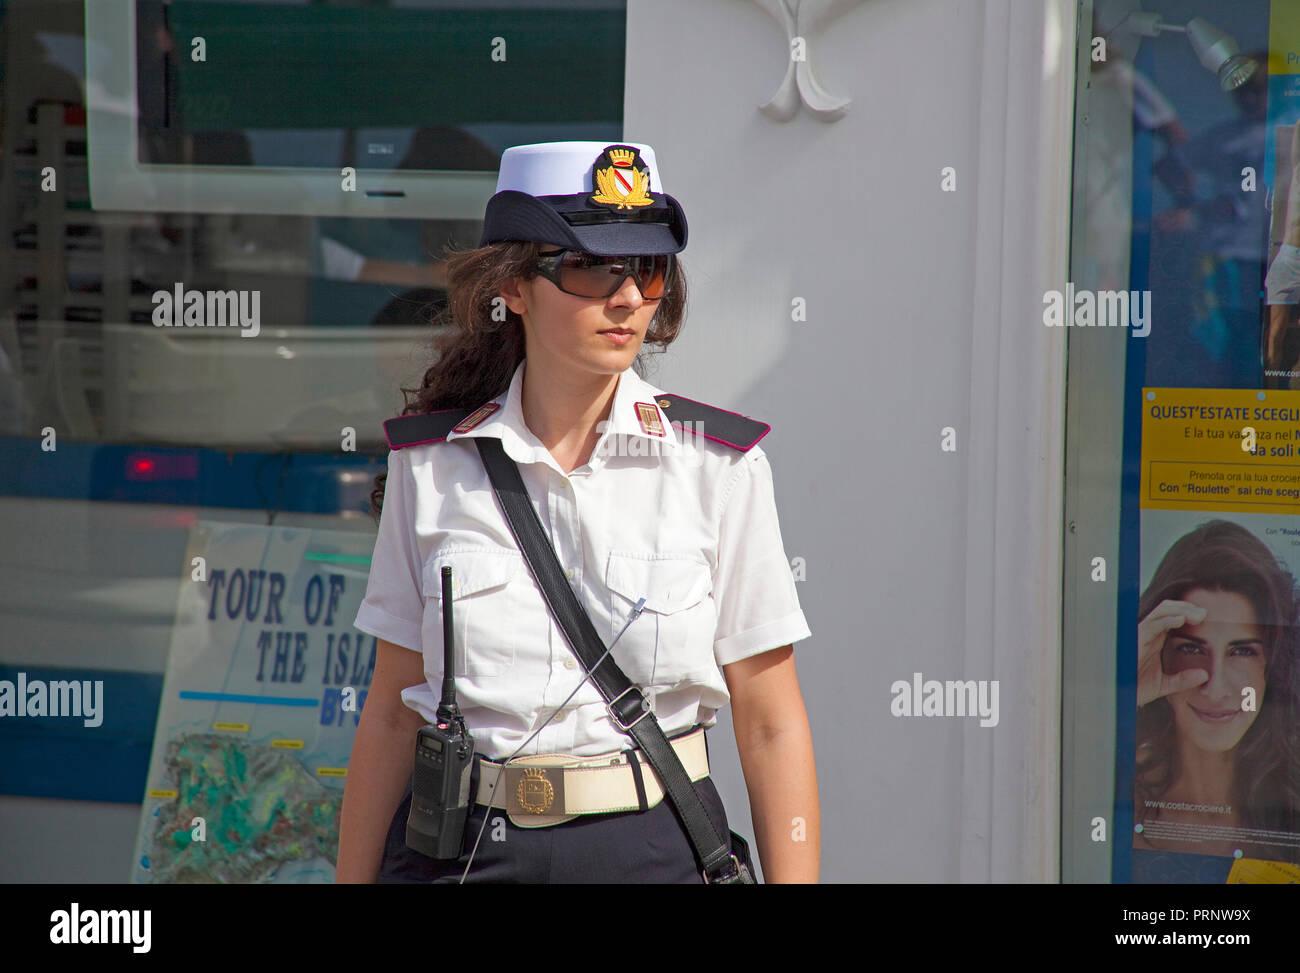 Polizistin in Capri, Insel Capri, Golf von Neapel, Kampanien, Italien   Police woman at Capri, Capri, island, Gulf of Naples, Campania, Italy - Stock Image